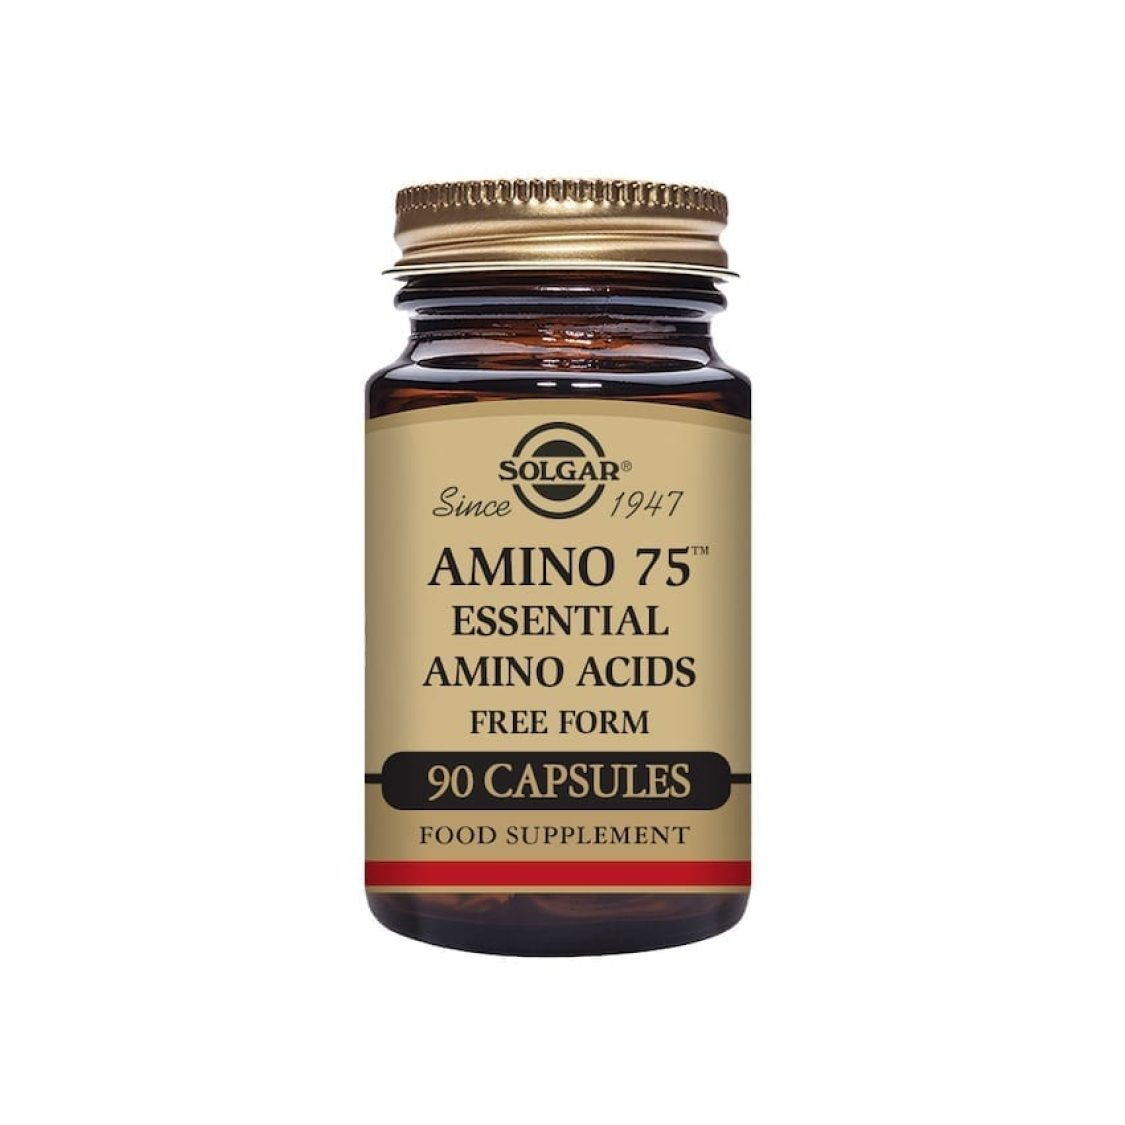 Solgar - Free Form Amino Acids - Amino 75 Vegicaps - Size: 90